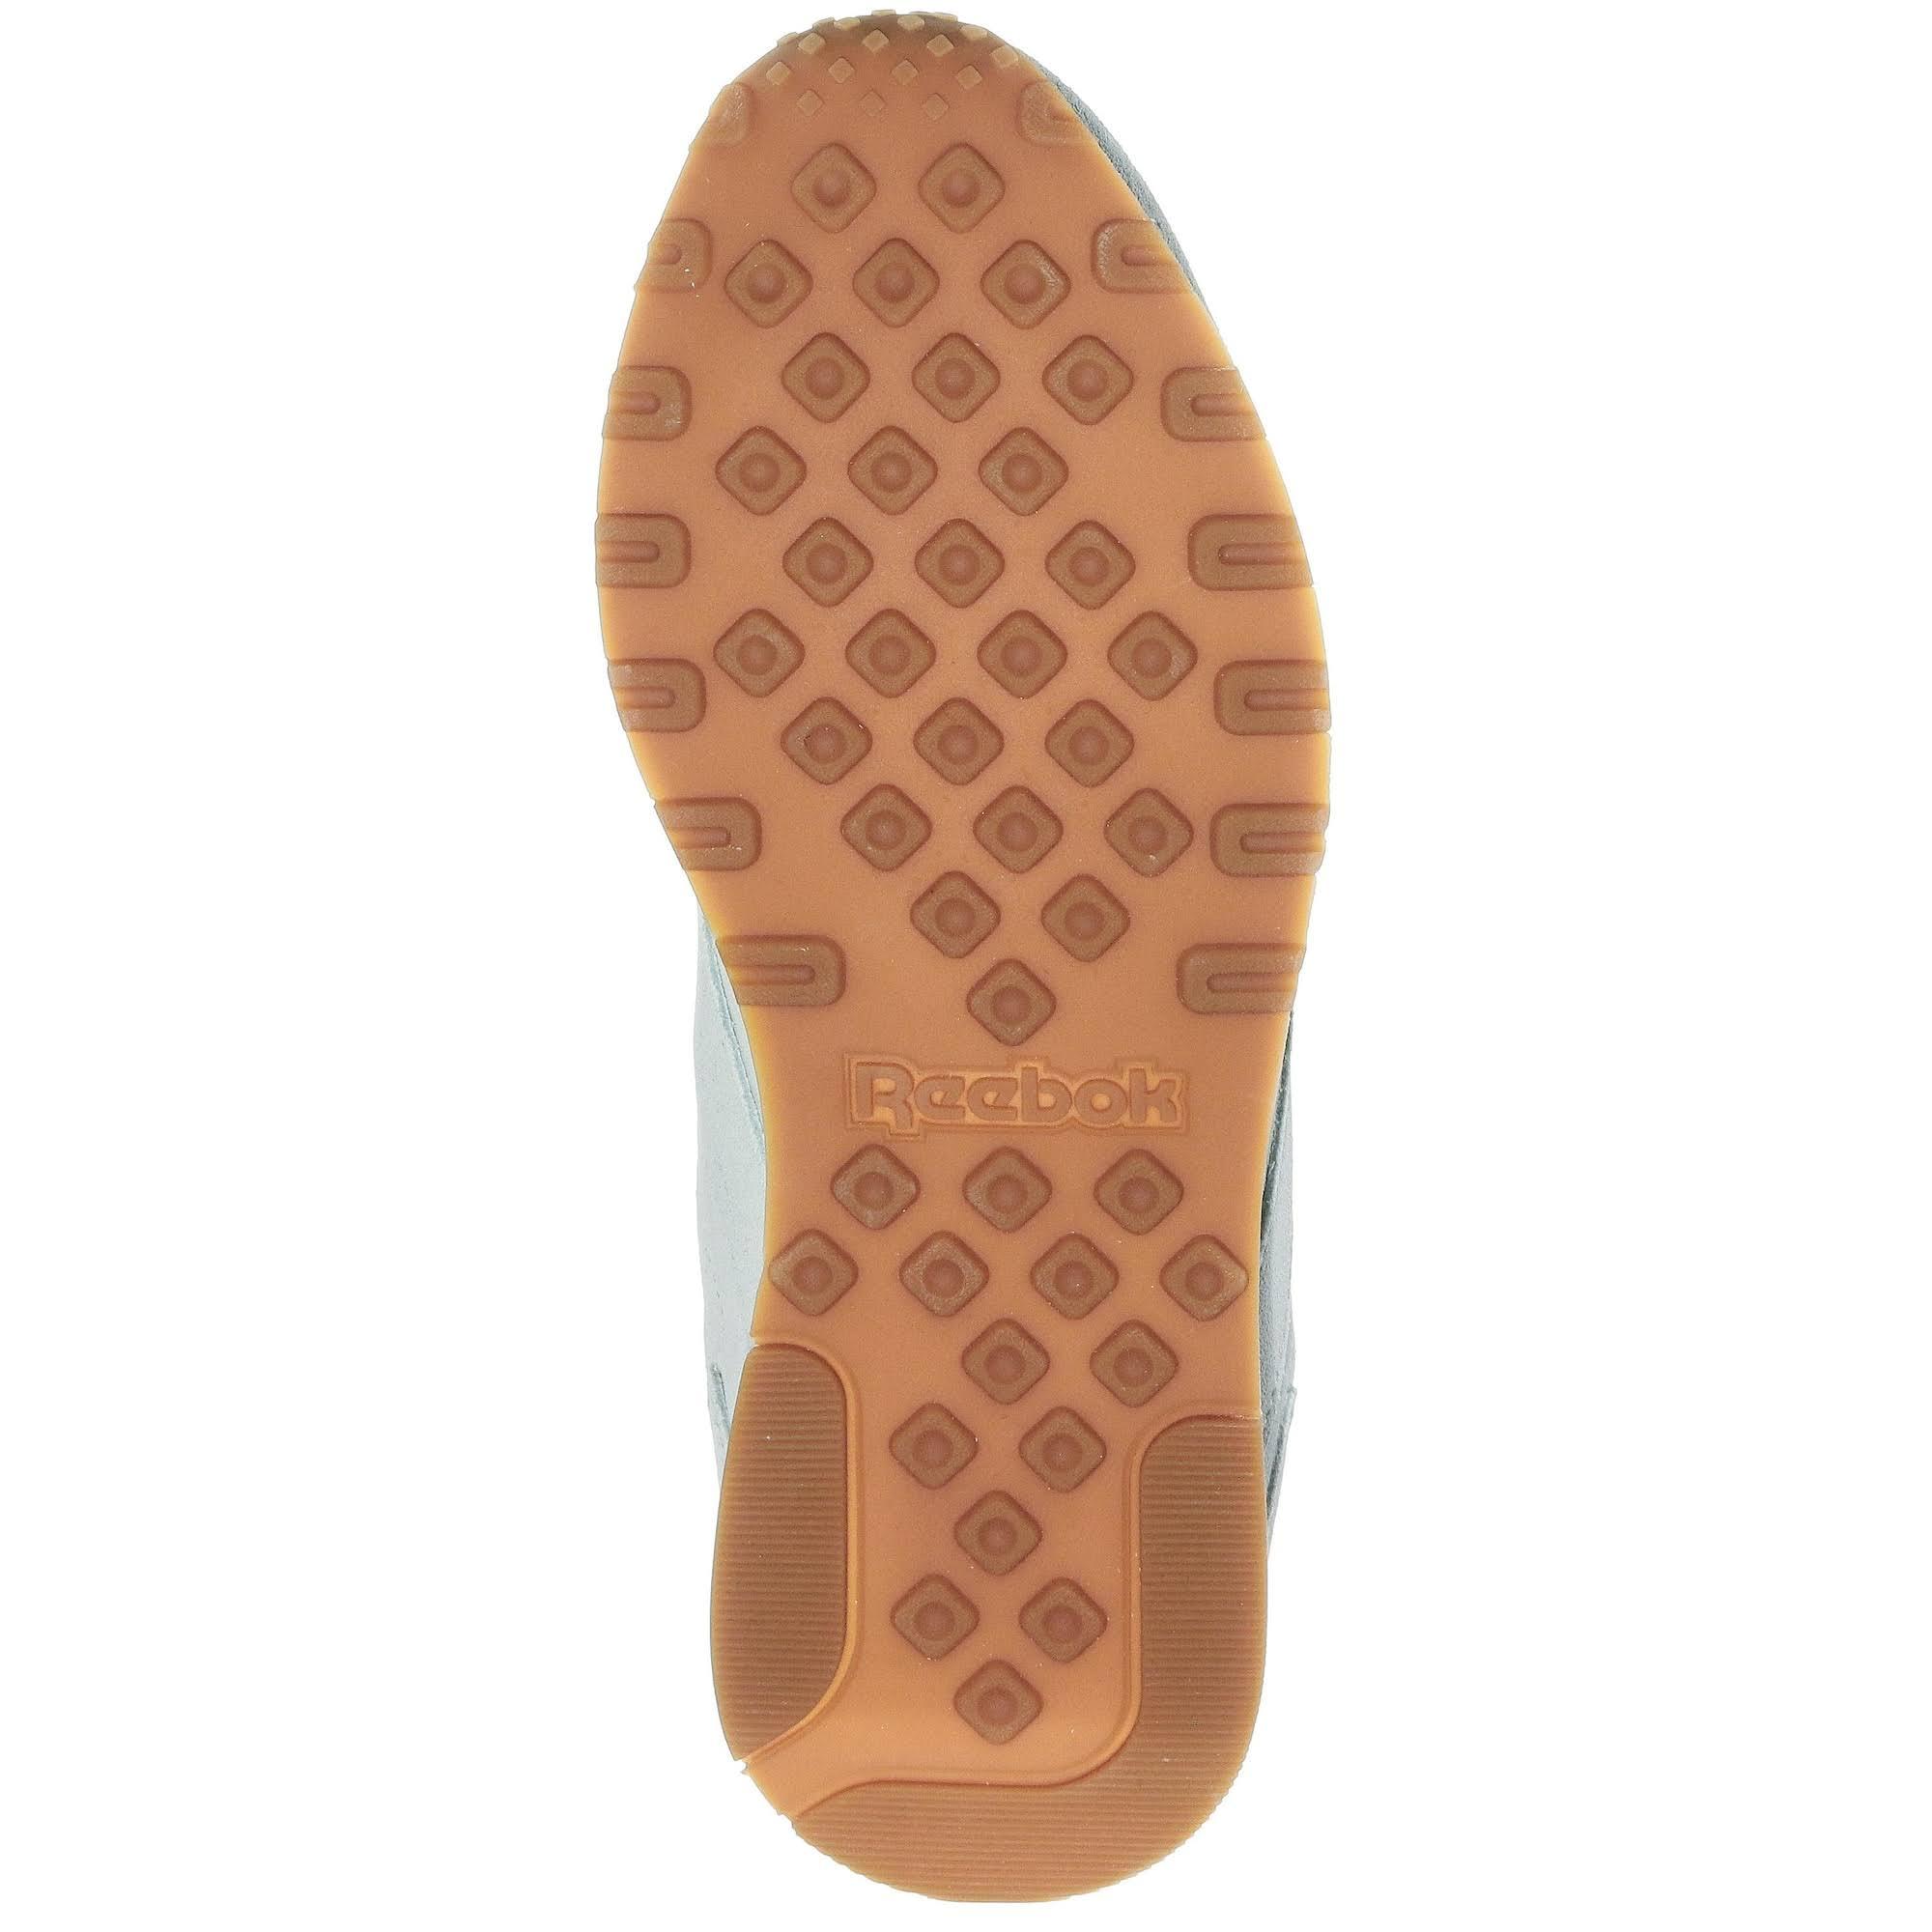 Glide Größe Leder 42 Lx Mint Royal Damen Sneaker Reebok 5XR6TqZ